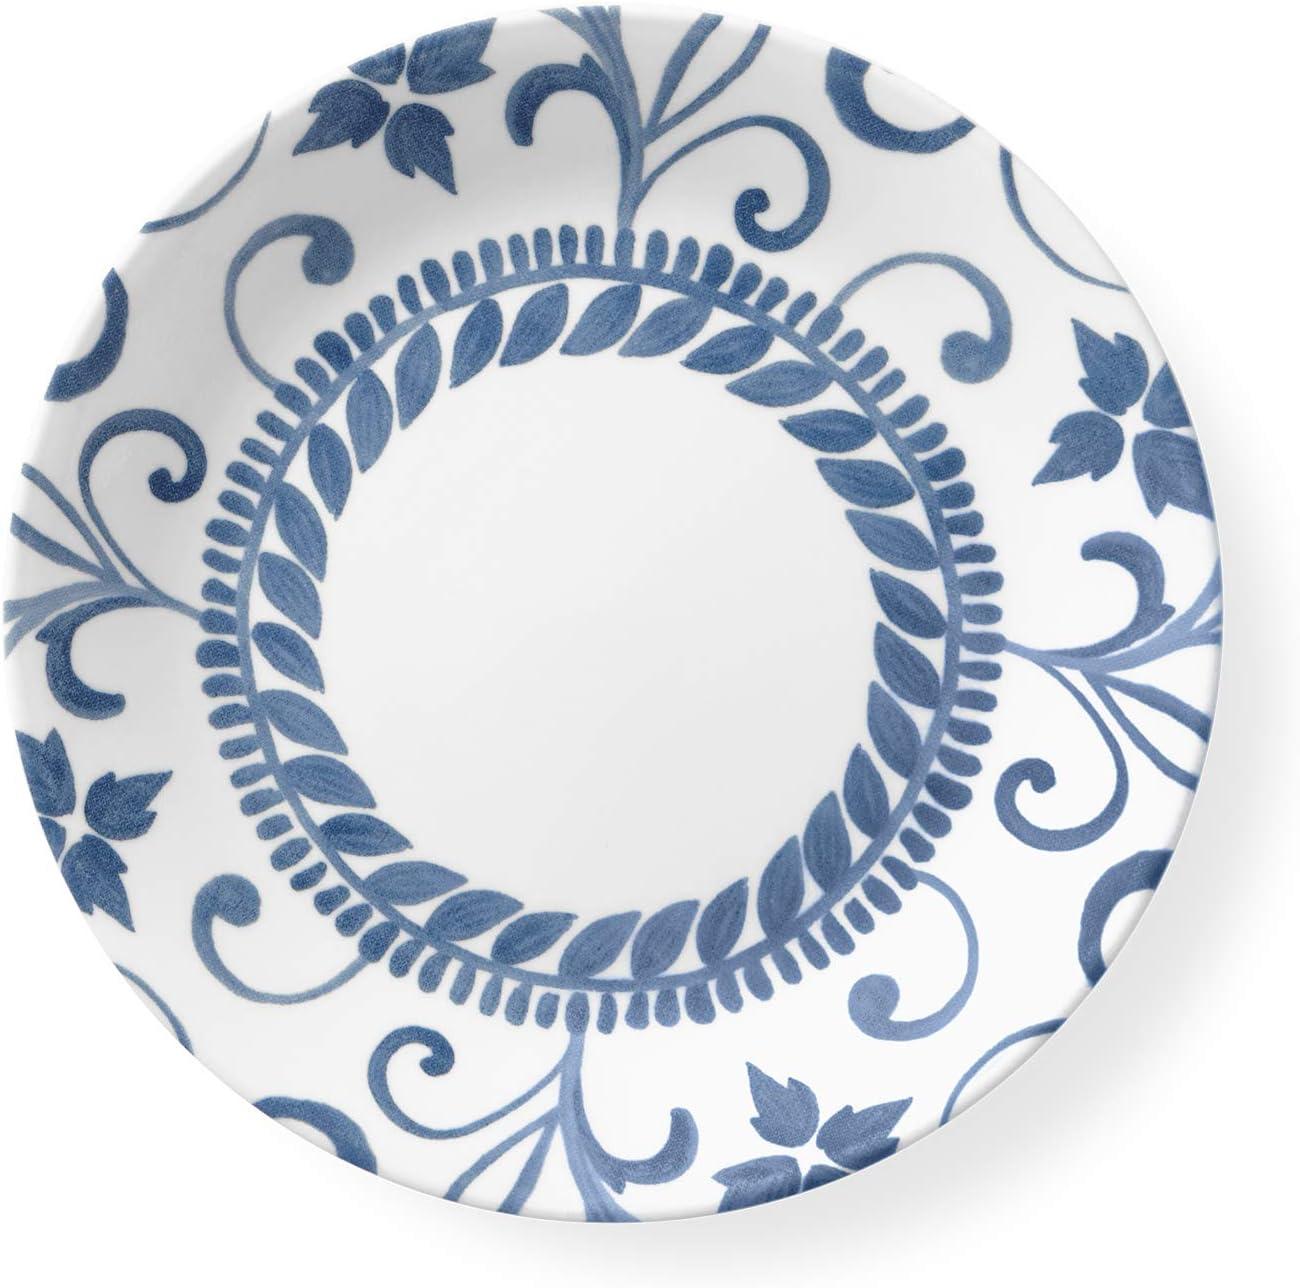 21.6cm Corelle Boutique Lunch Plate Artemis 8.5in 6 Pack